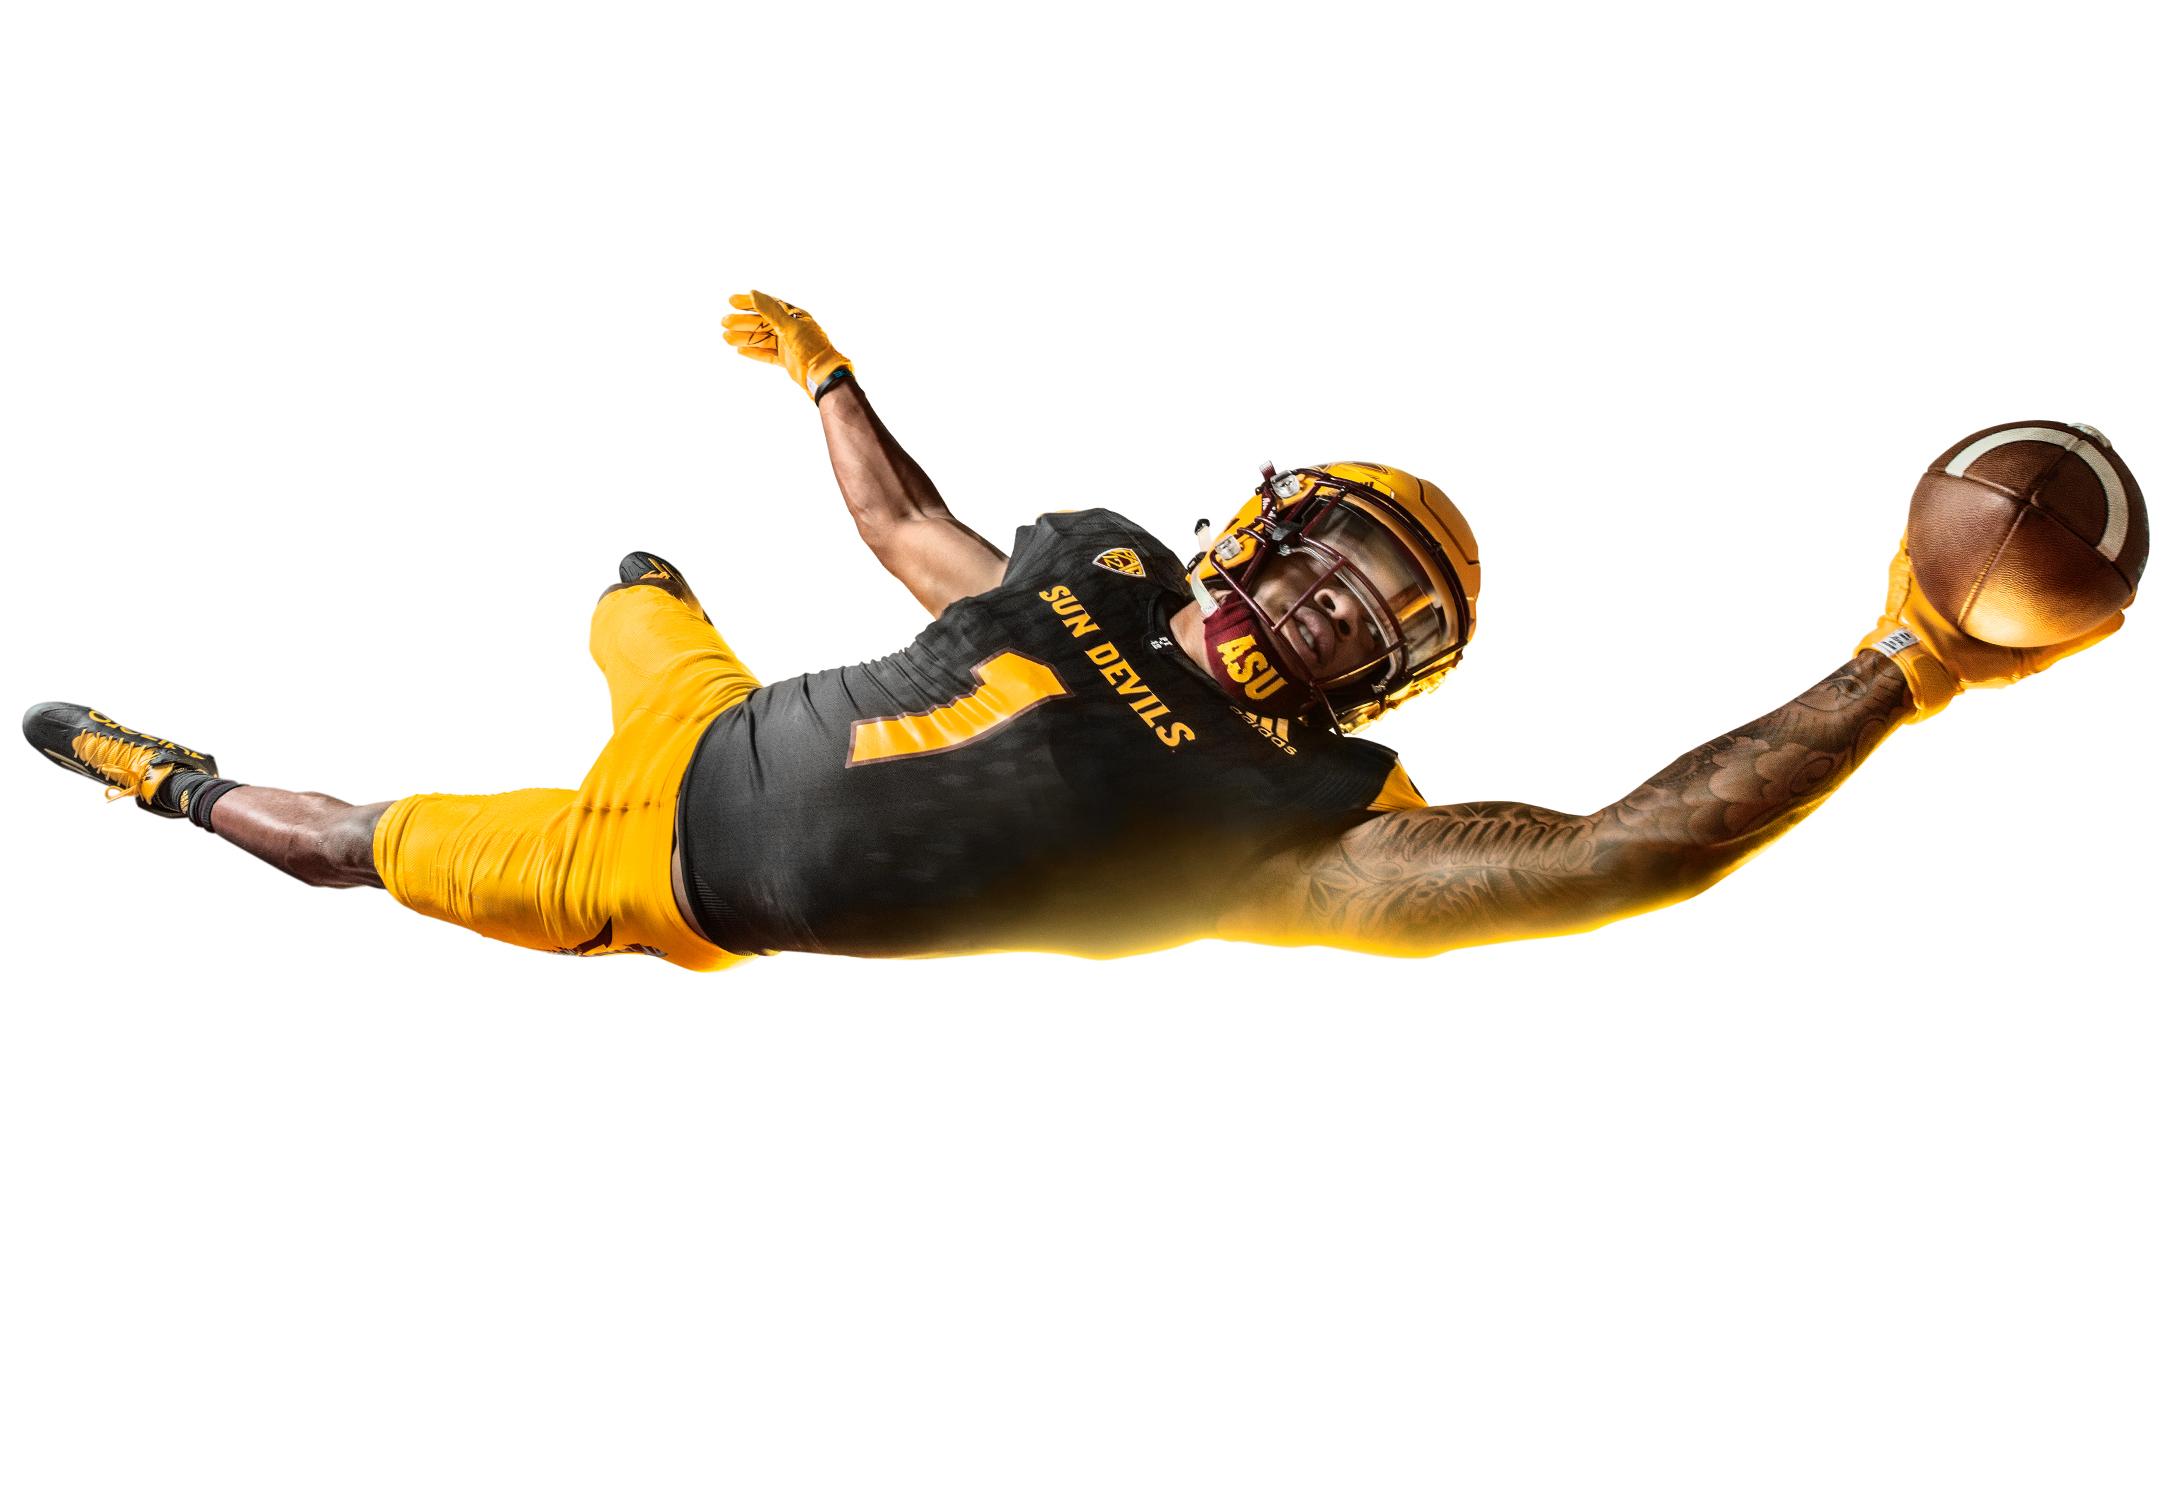 FY18 ASU  SUN DEVIL    FOOTBALL  Photoshoot  BREAKTHROUGH   Creative + Art Direction  with  photographer   Blair Bunting    cr8@ sun devil athletics, arizona state university